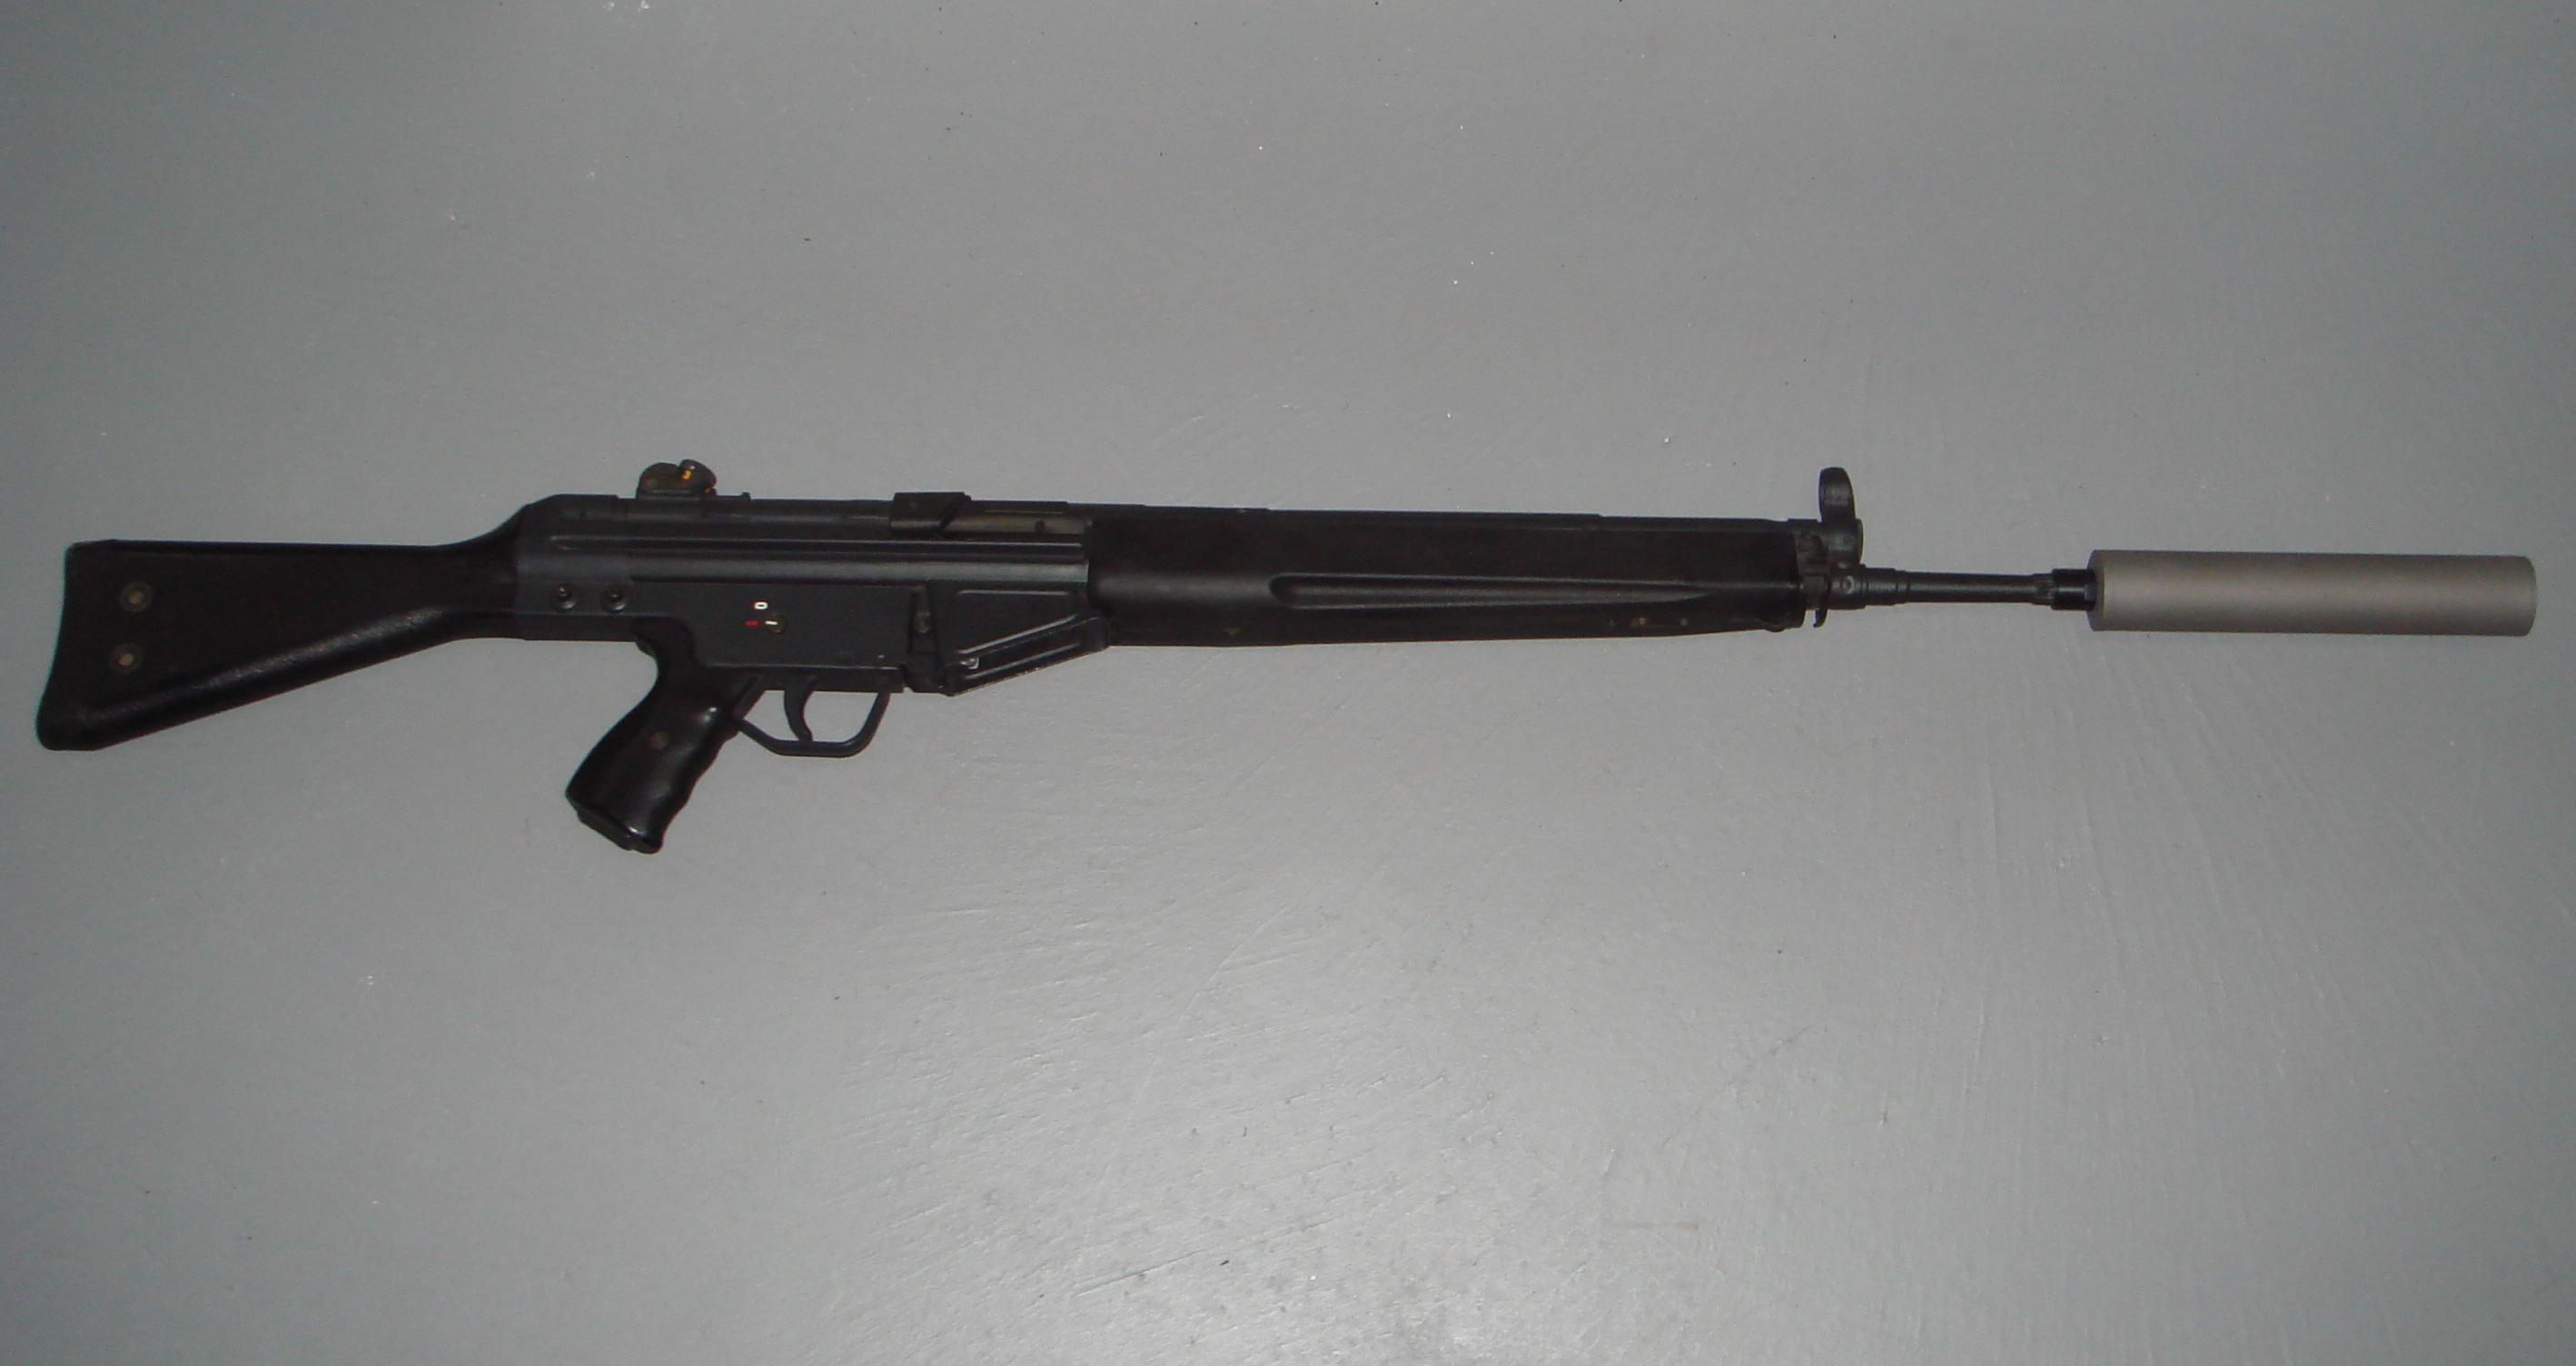 Suppressed HK91/SR-dsc05478.jpg